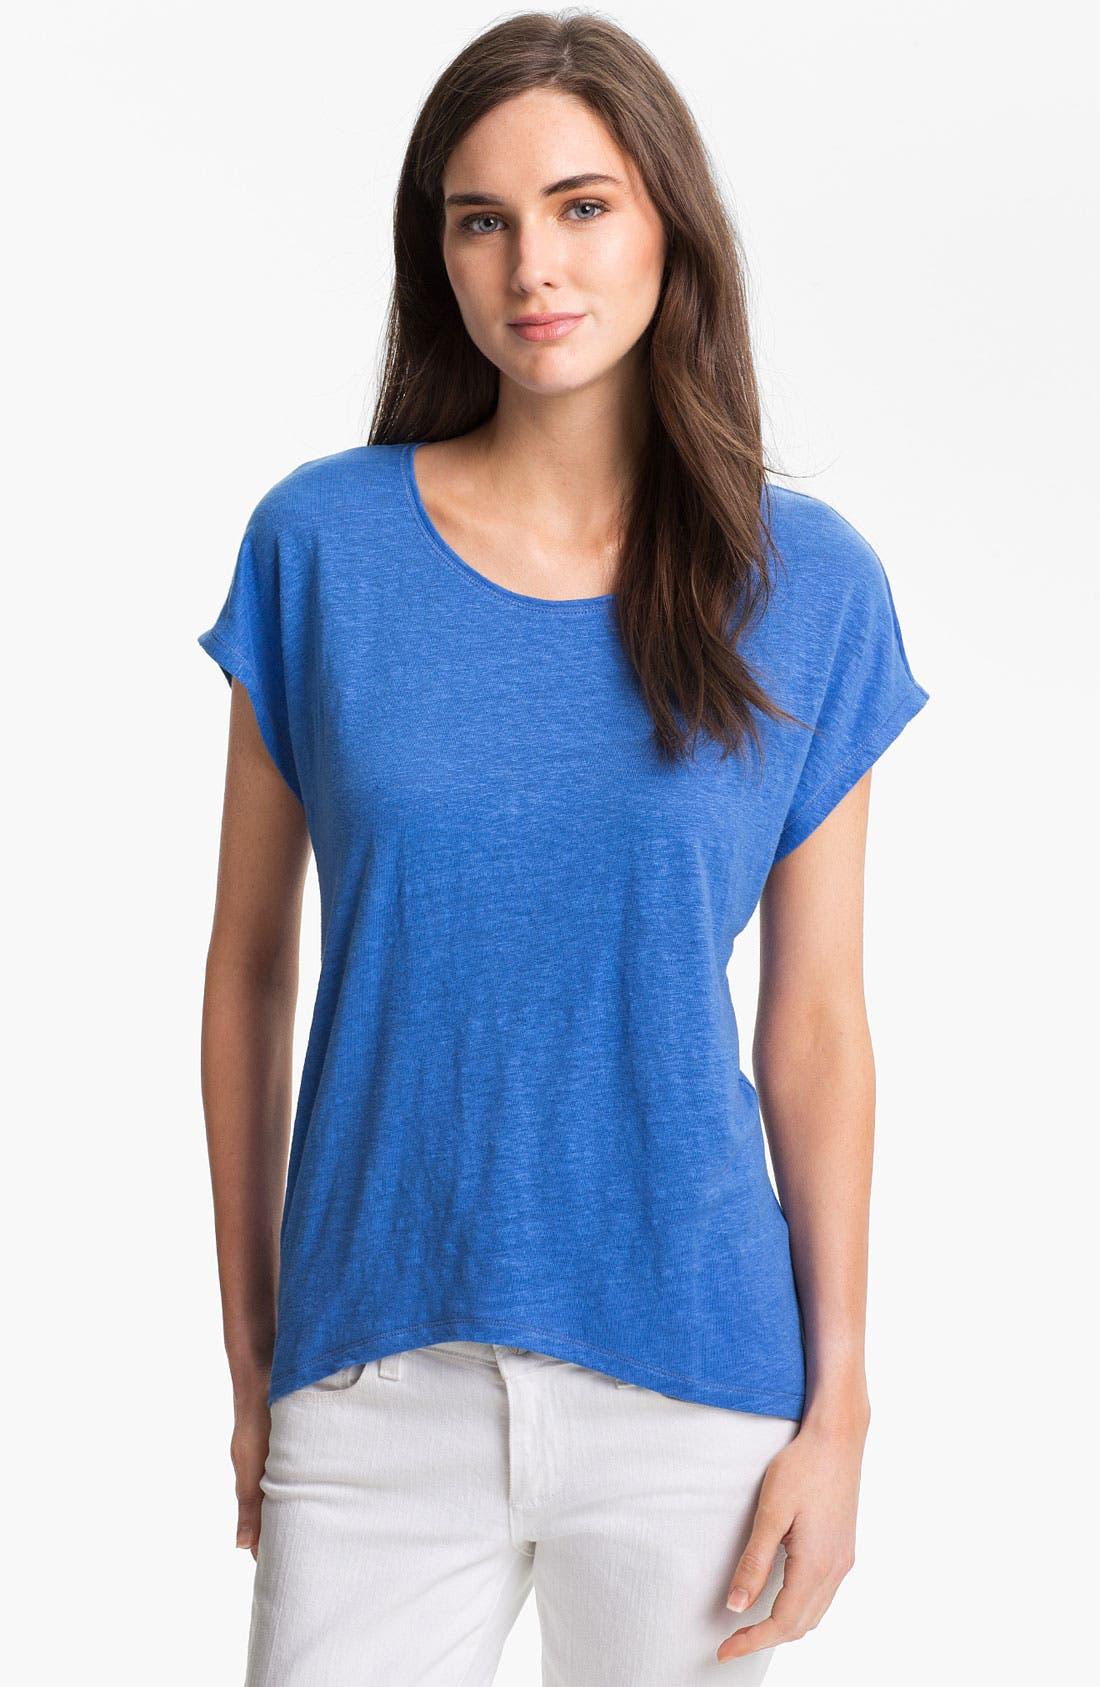 Alternate Image 1 Selected - Eileen Fisher Cap Sleeve Linen Tee (Petite)